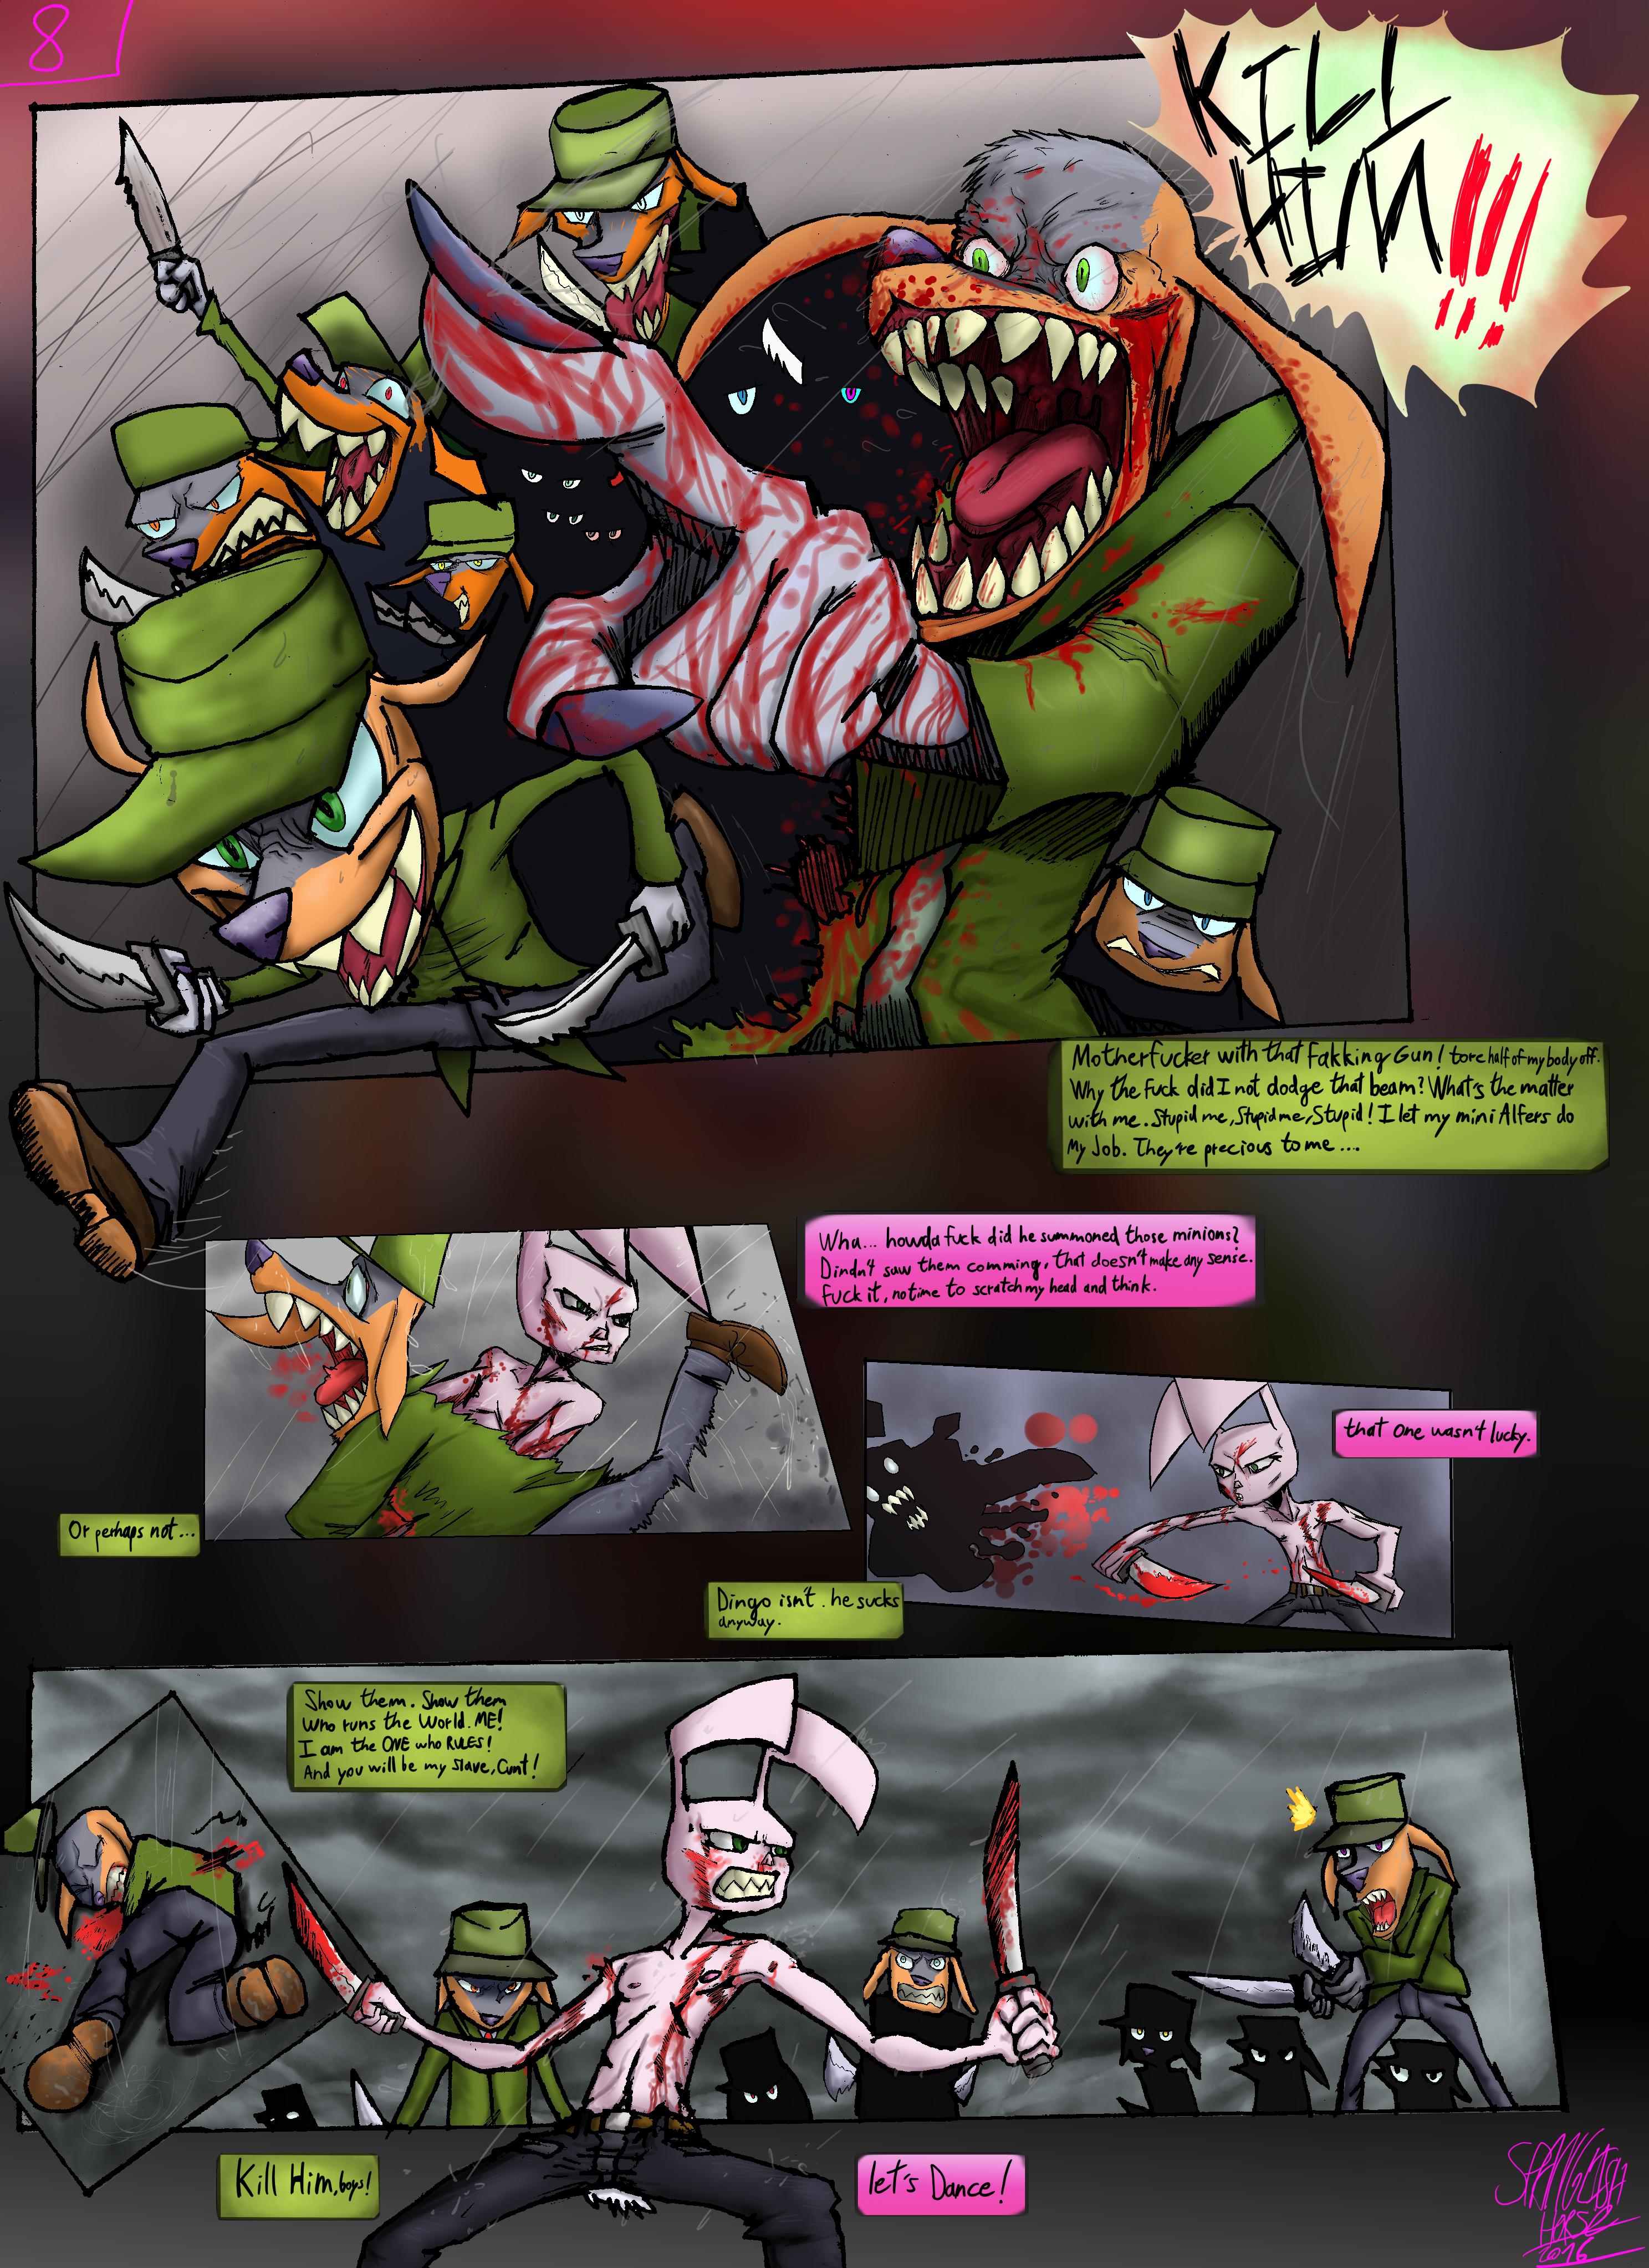 Bob the Psycho Rabbit Vs Alfred Alfer Page 8 (comic) (8/39)